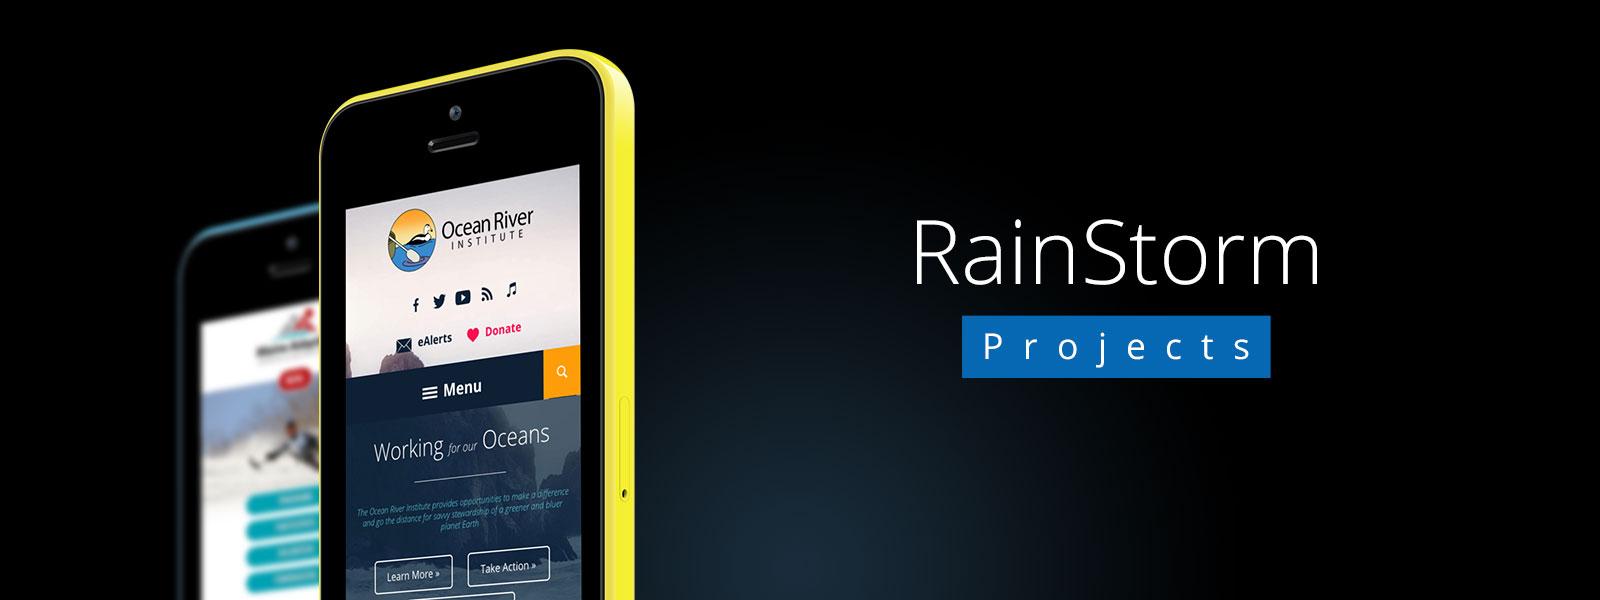 RainStorm Projects